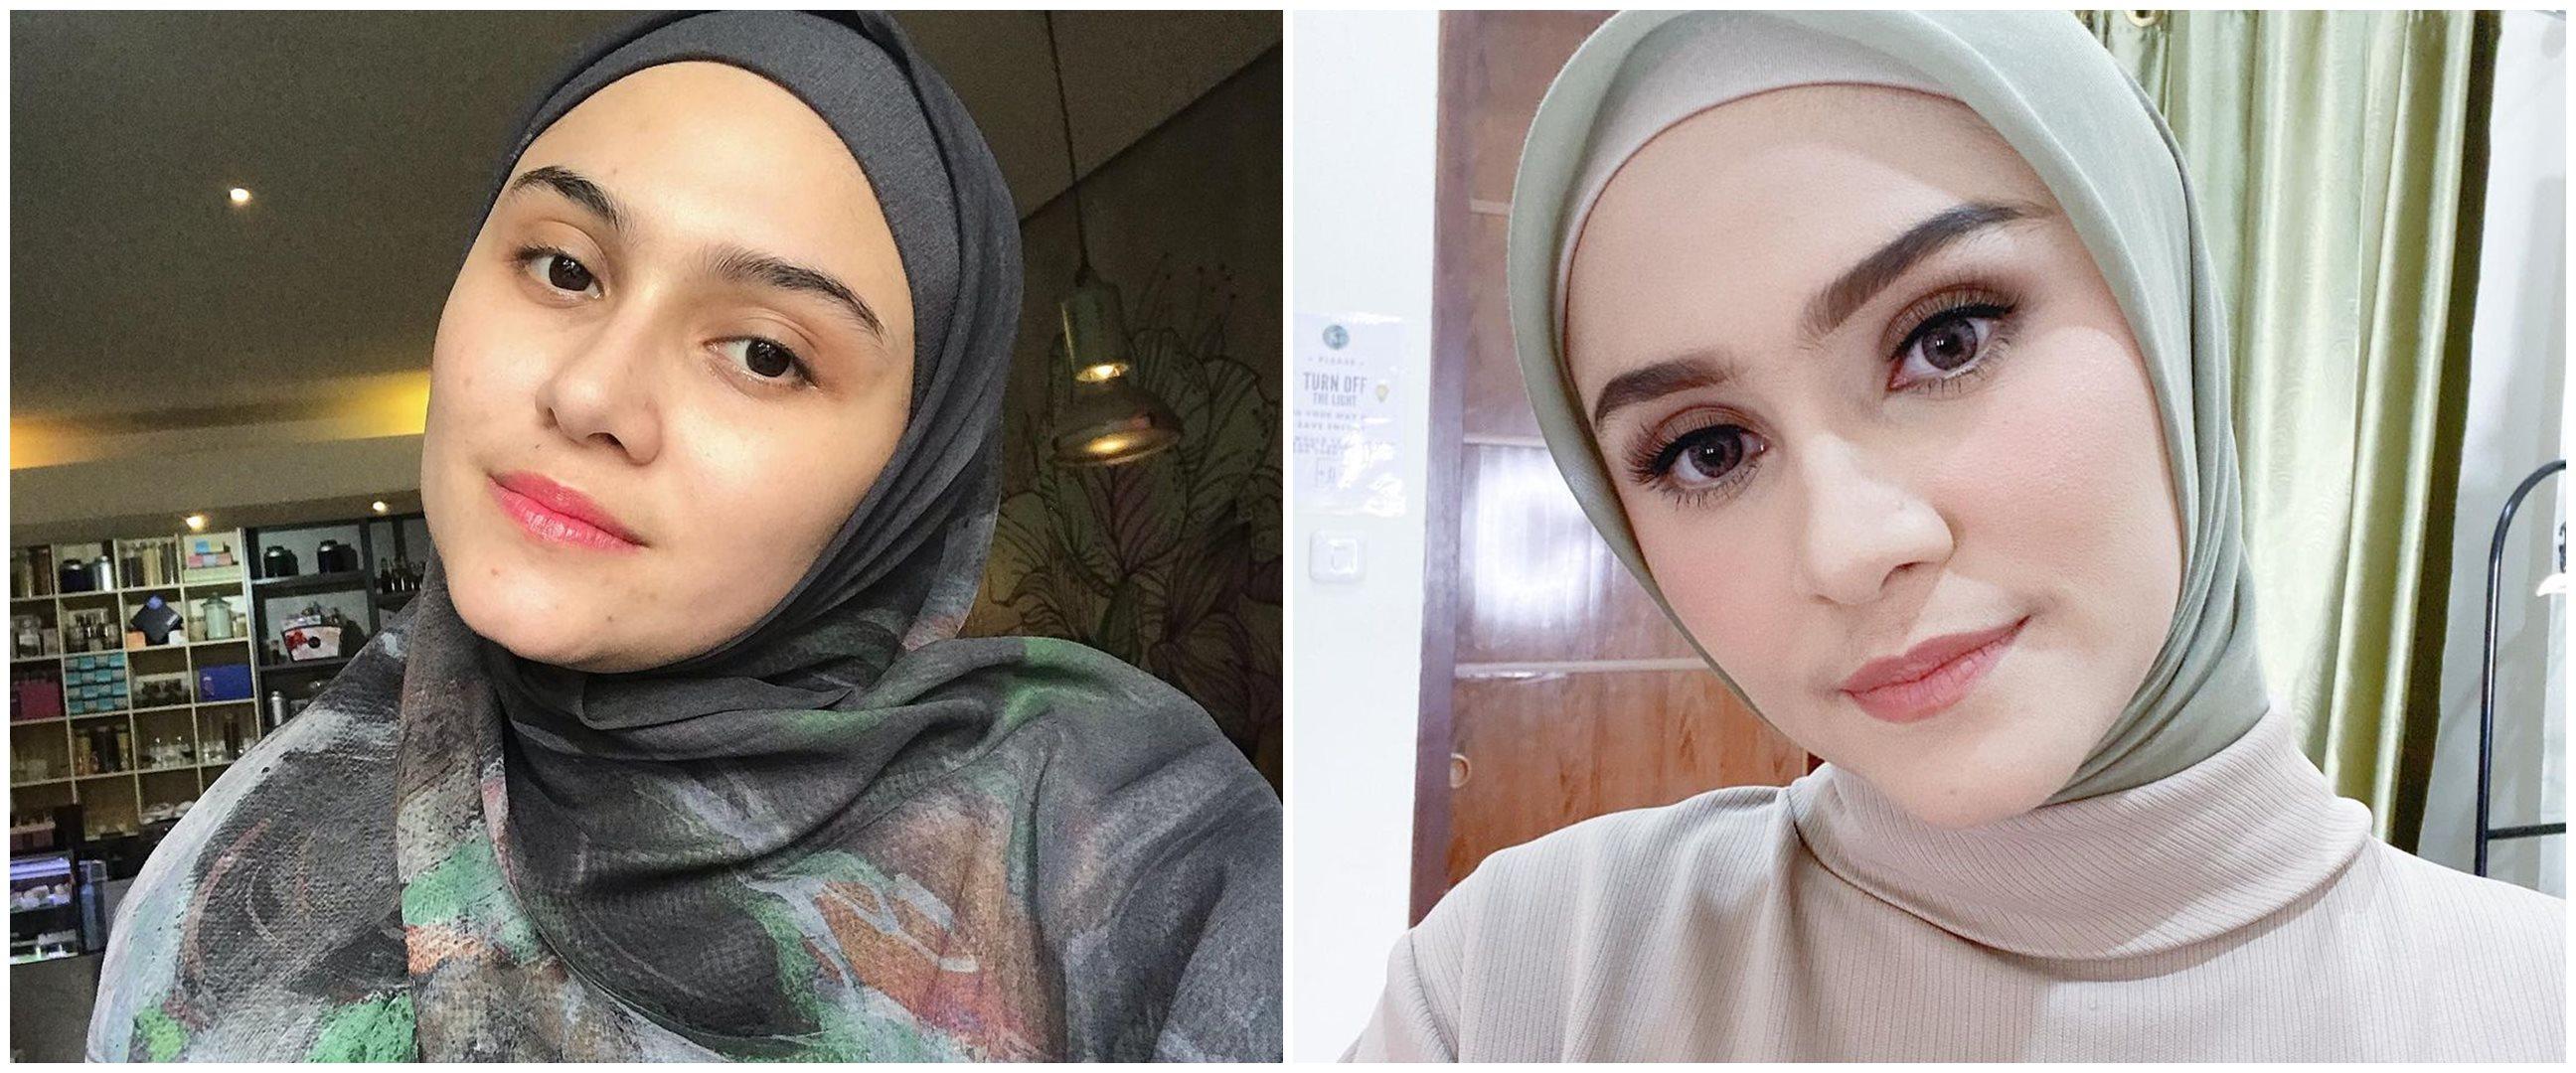 Biasa tampil natural, ini 10 potret Zee Zee Shahab pakai makeup tebal